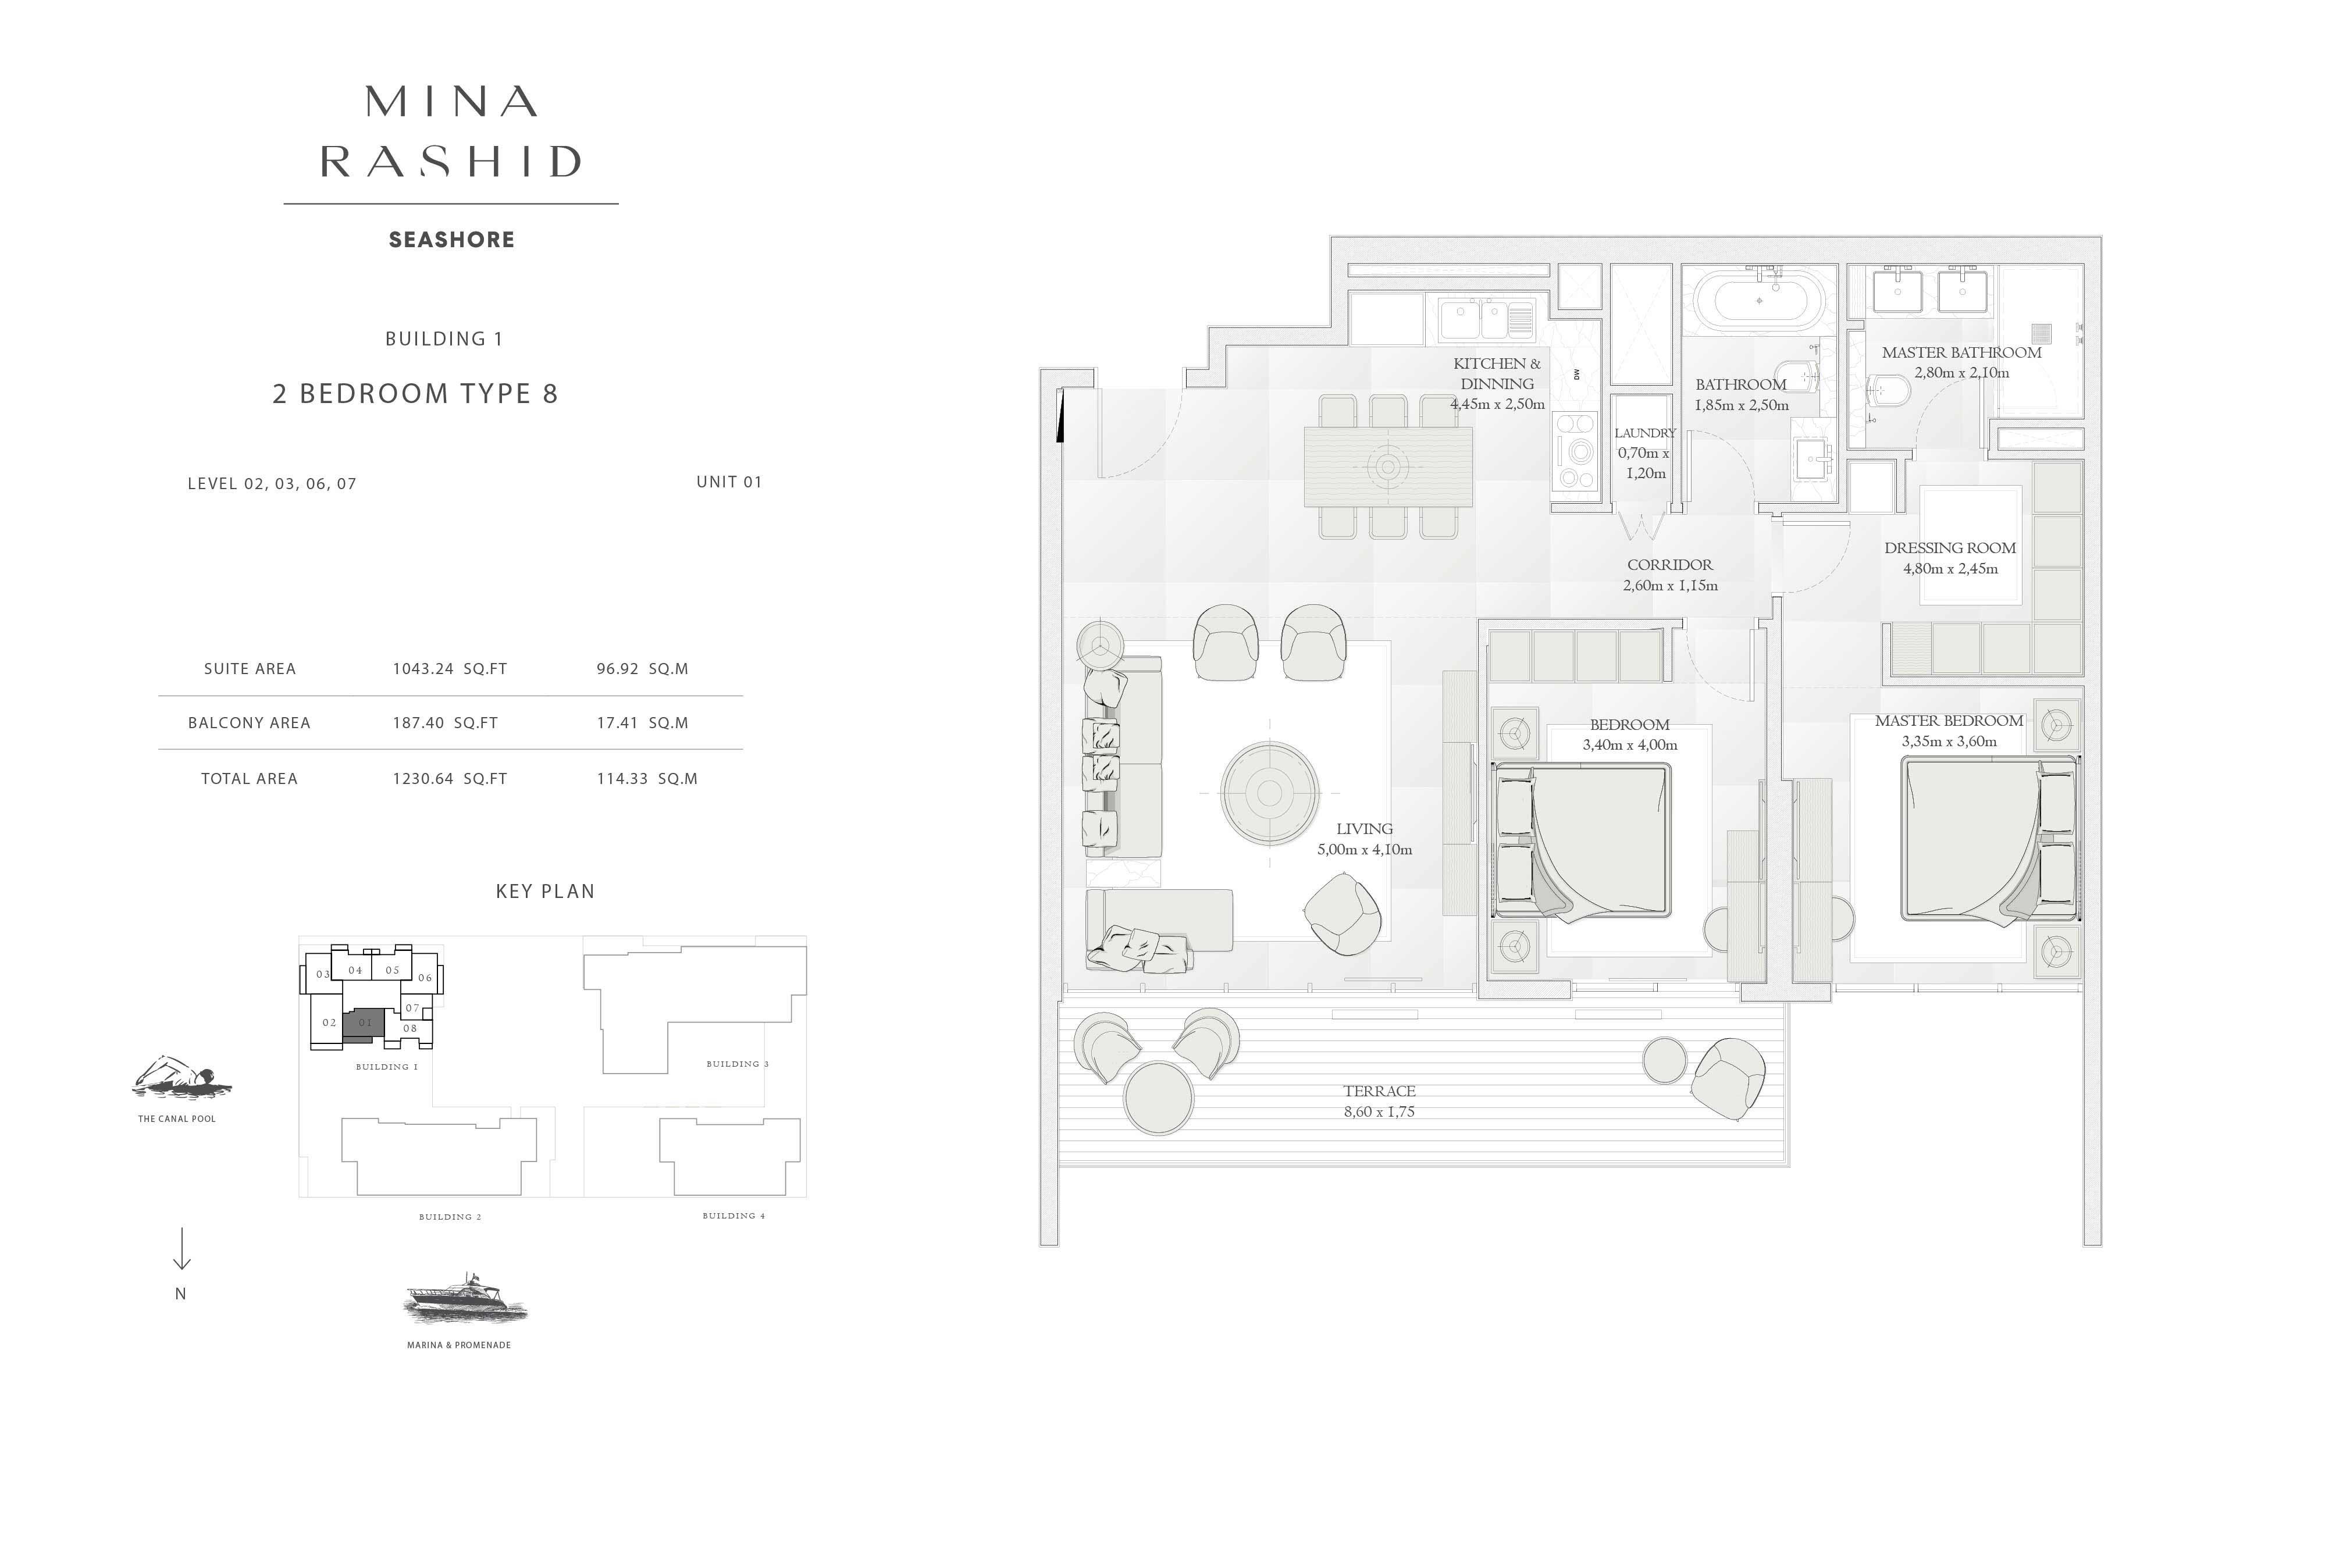 Building-1, 2-Bedroom-Type-8, Size-1230-Sq Ft